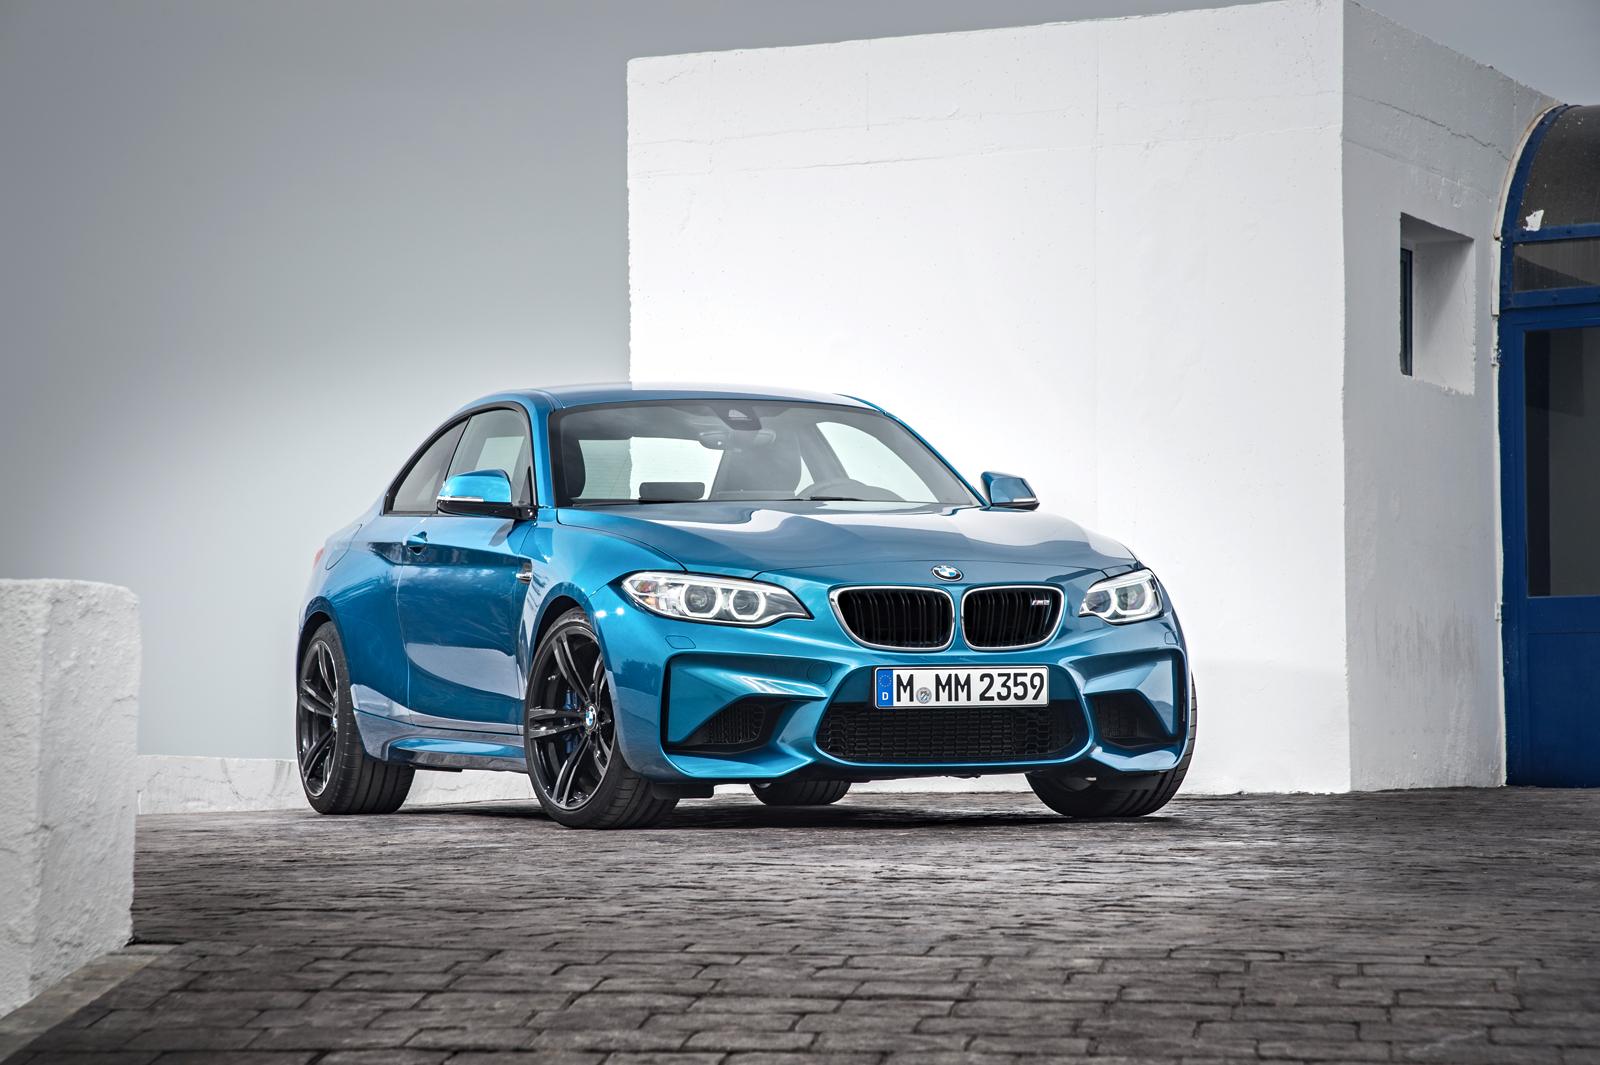 BMW M2 Coupe Dekstop Wallpapers HQ   Car Wallpapers HQ 1600x1065